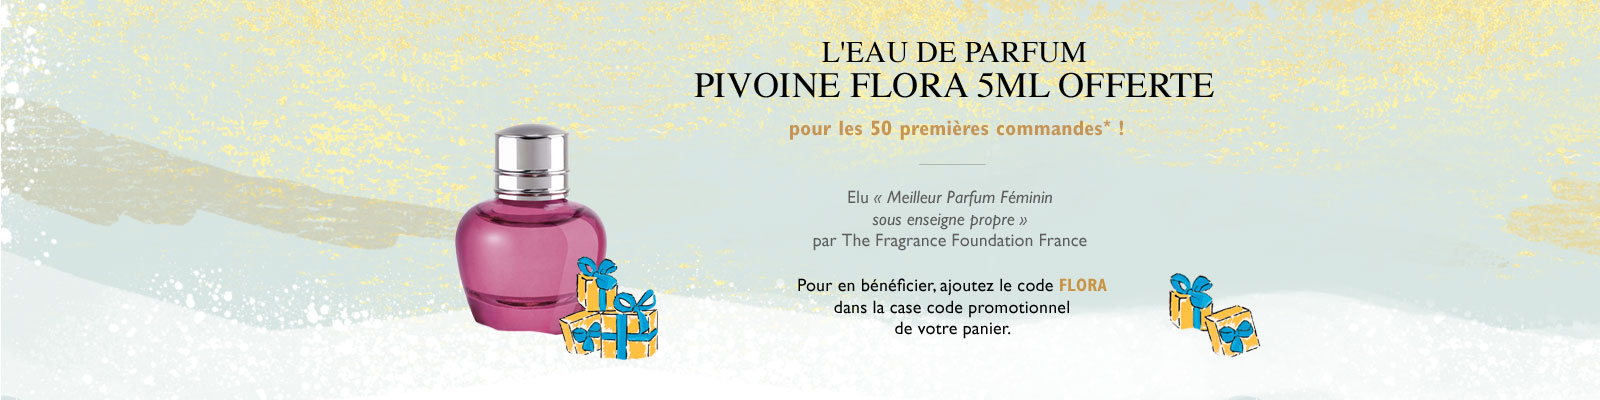 Offre Pivoine - L'Occitane France